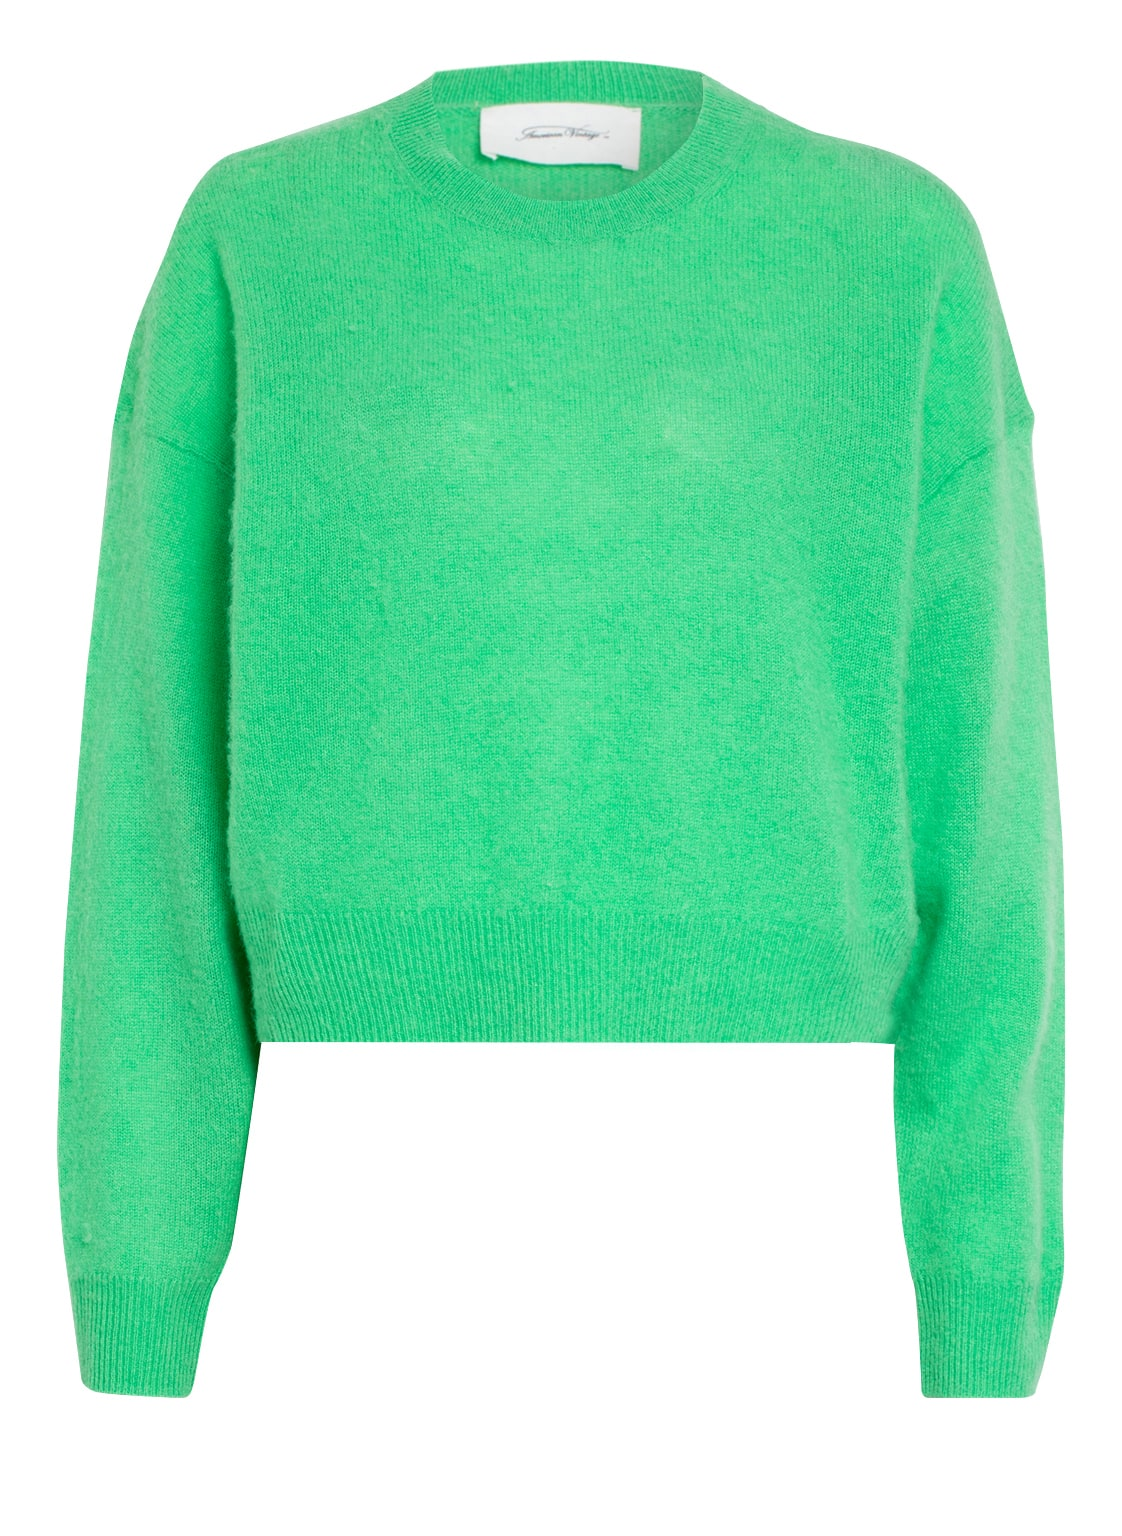 Image of American Vintage Cashmere-Pullover gruen